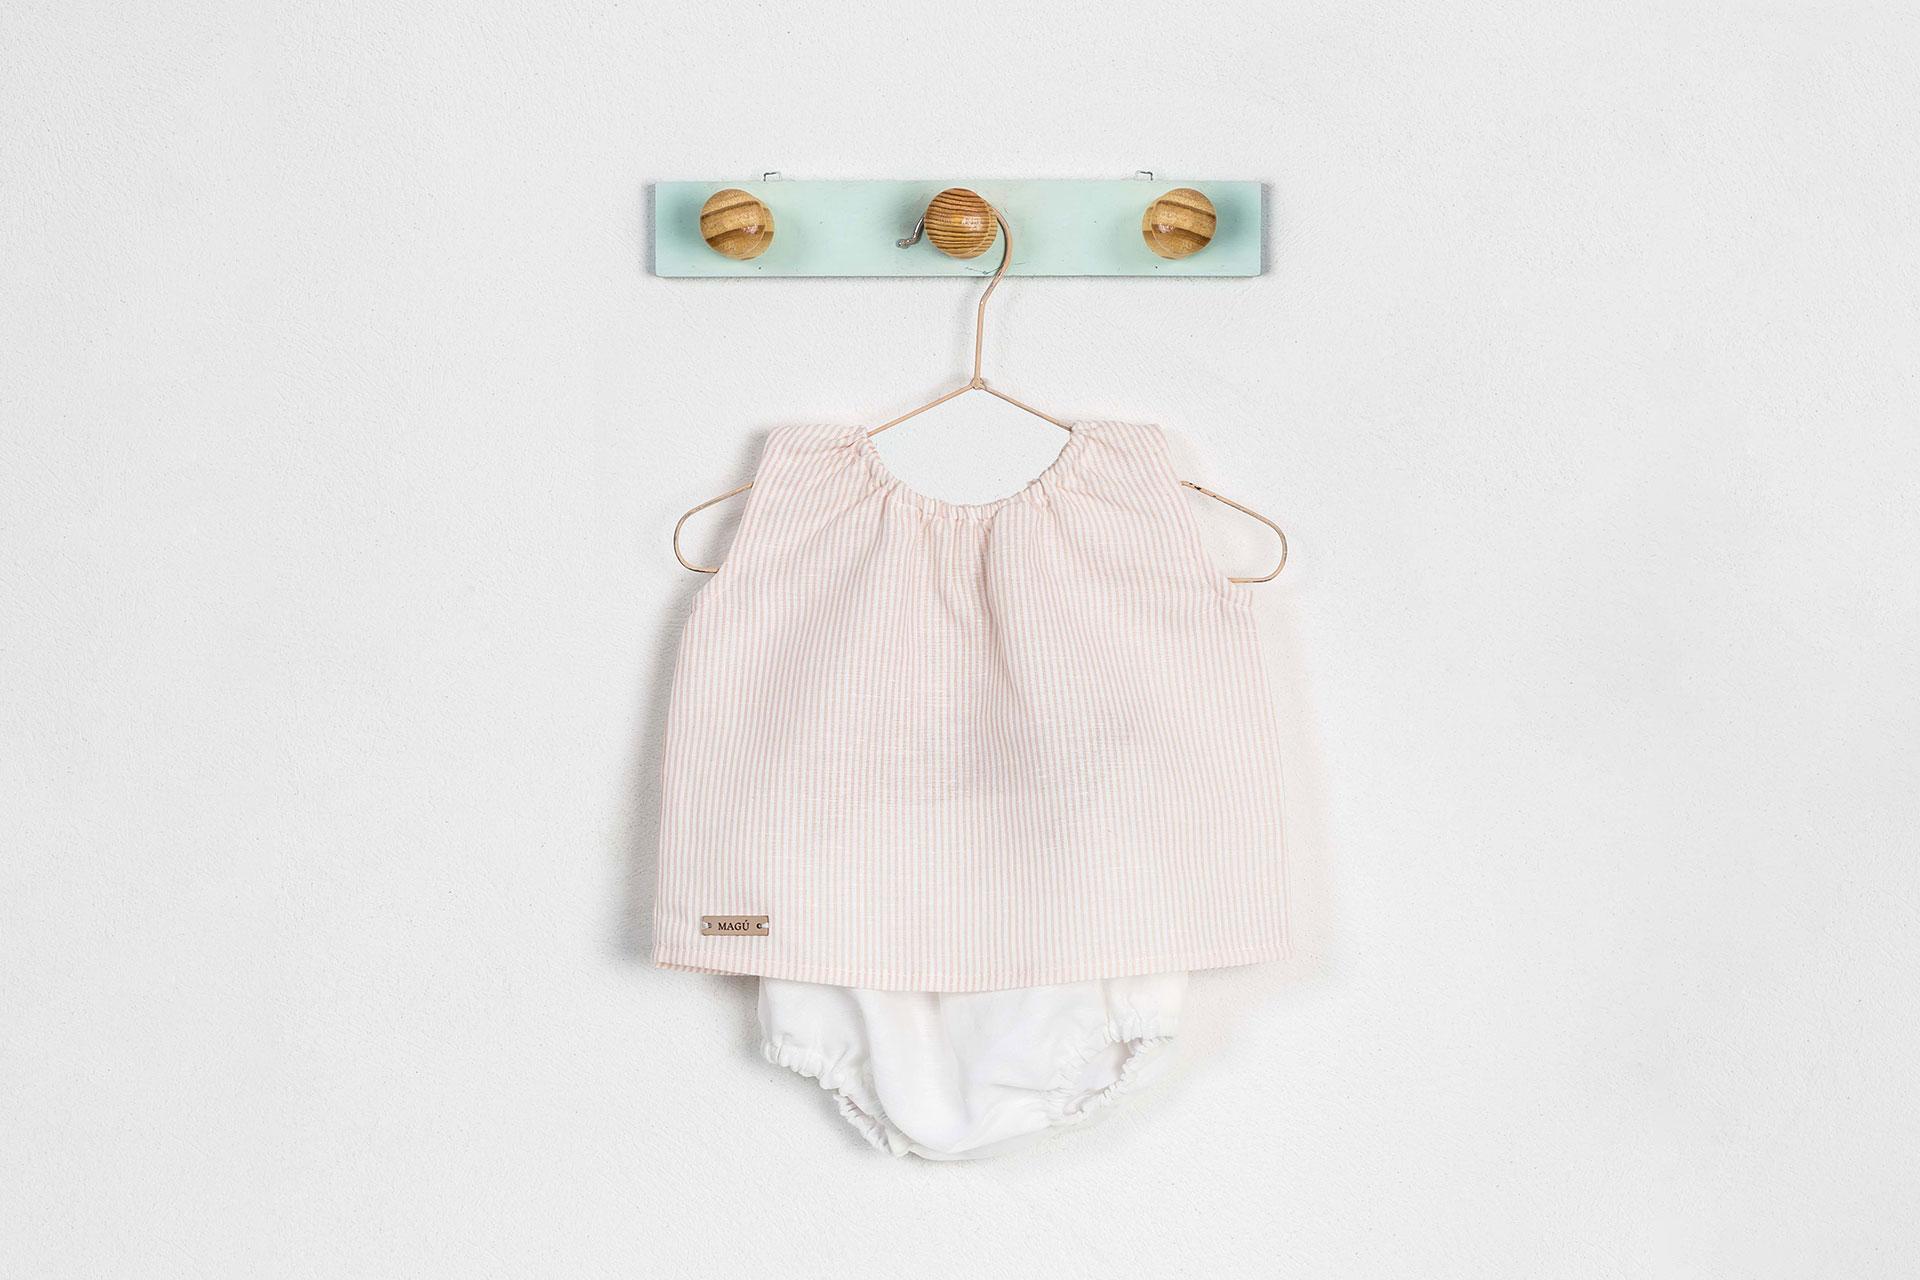 ropa-de-bebe-primavera-verano